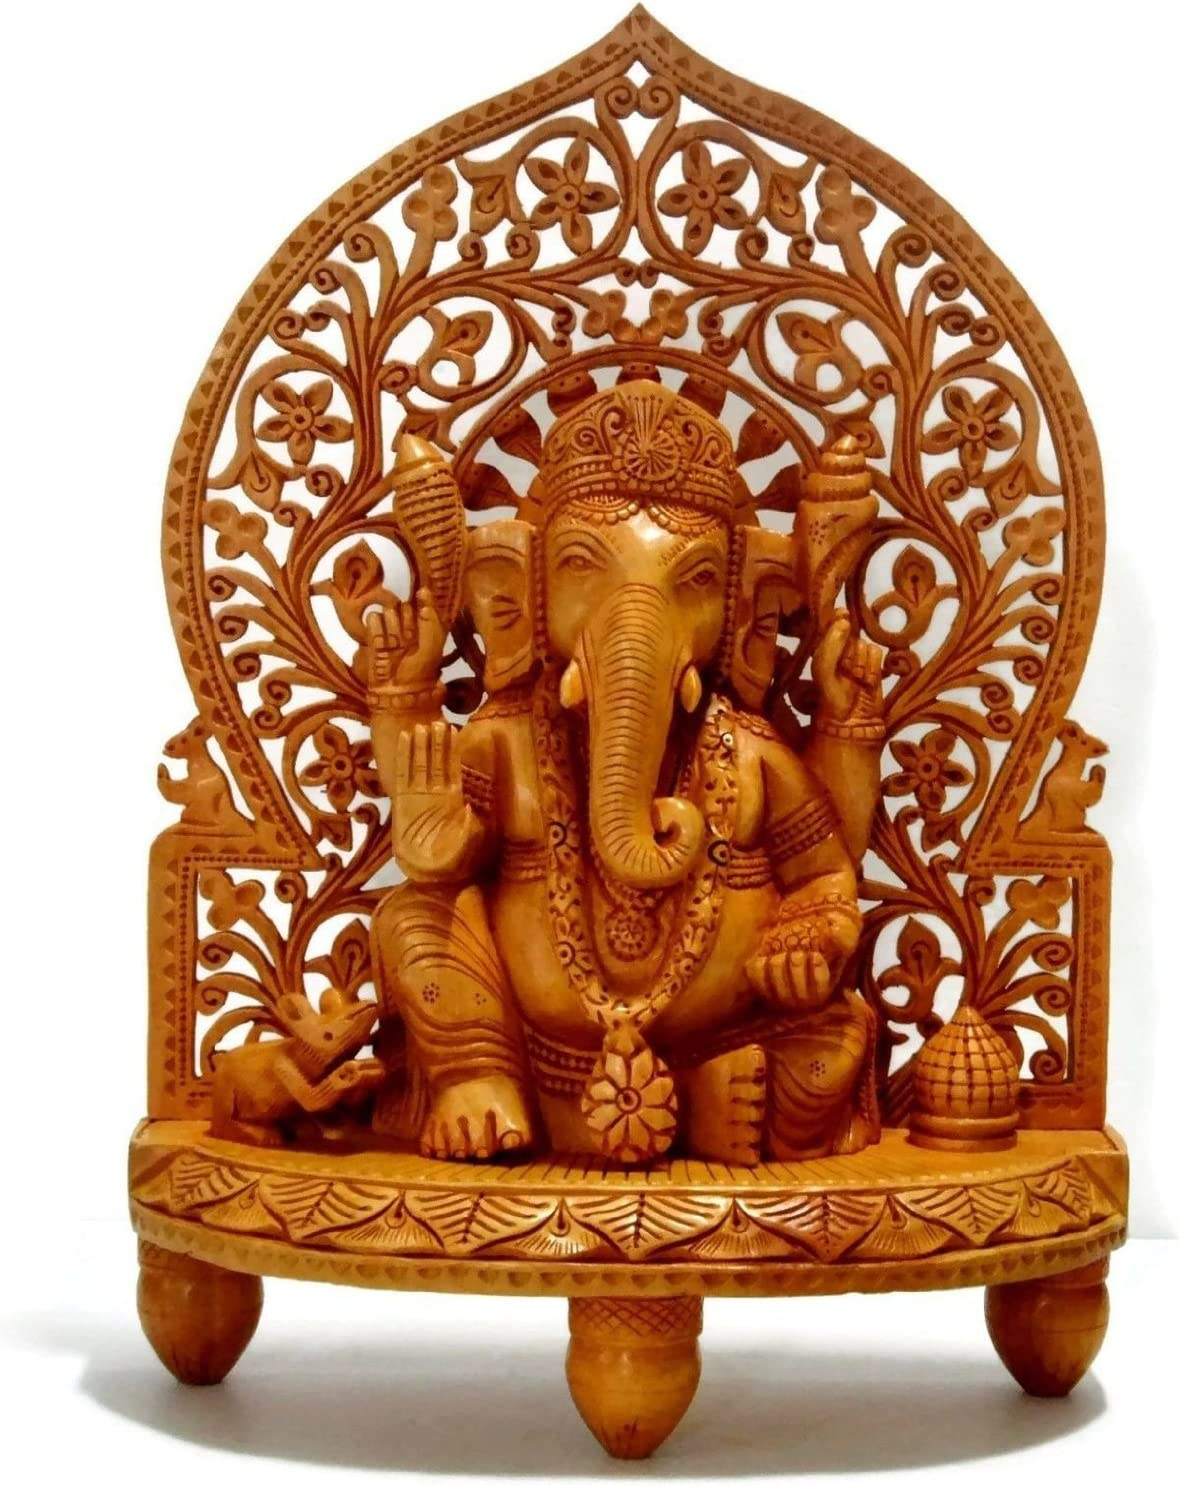 CraftVatika Large Ganesh Ganesha Idol Statue- Wooden Hand Carved Elephant Lord Ganesha Ganpati Temple Sculpture (10)